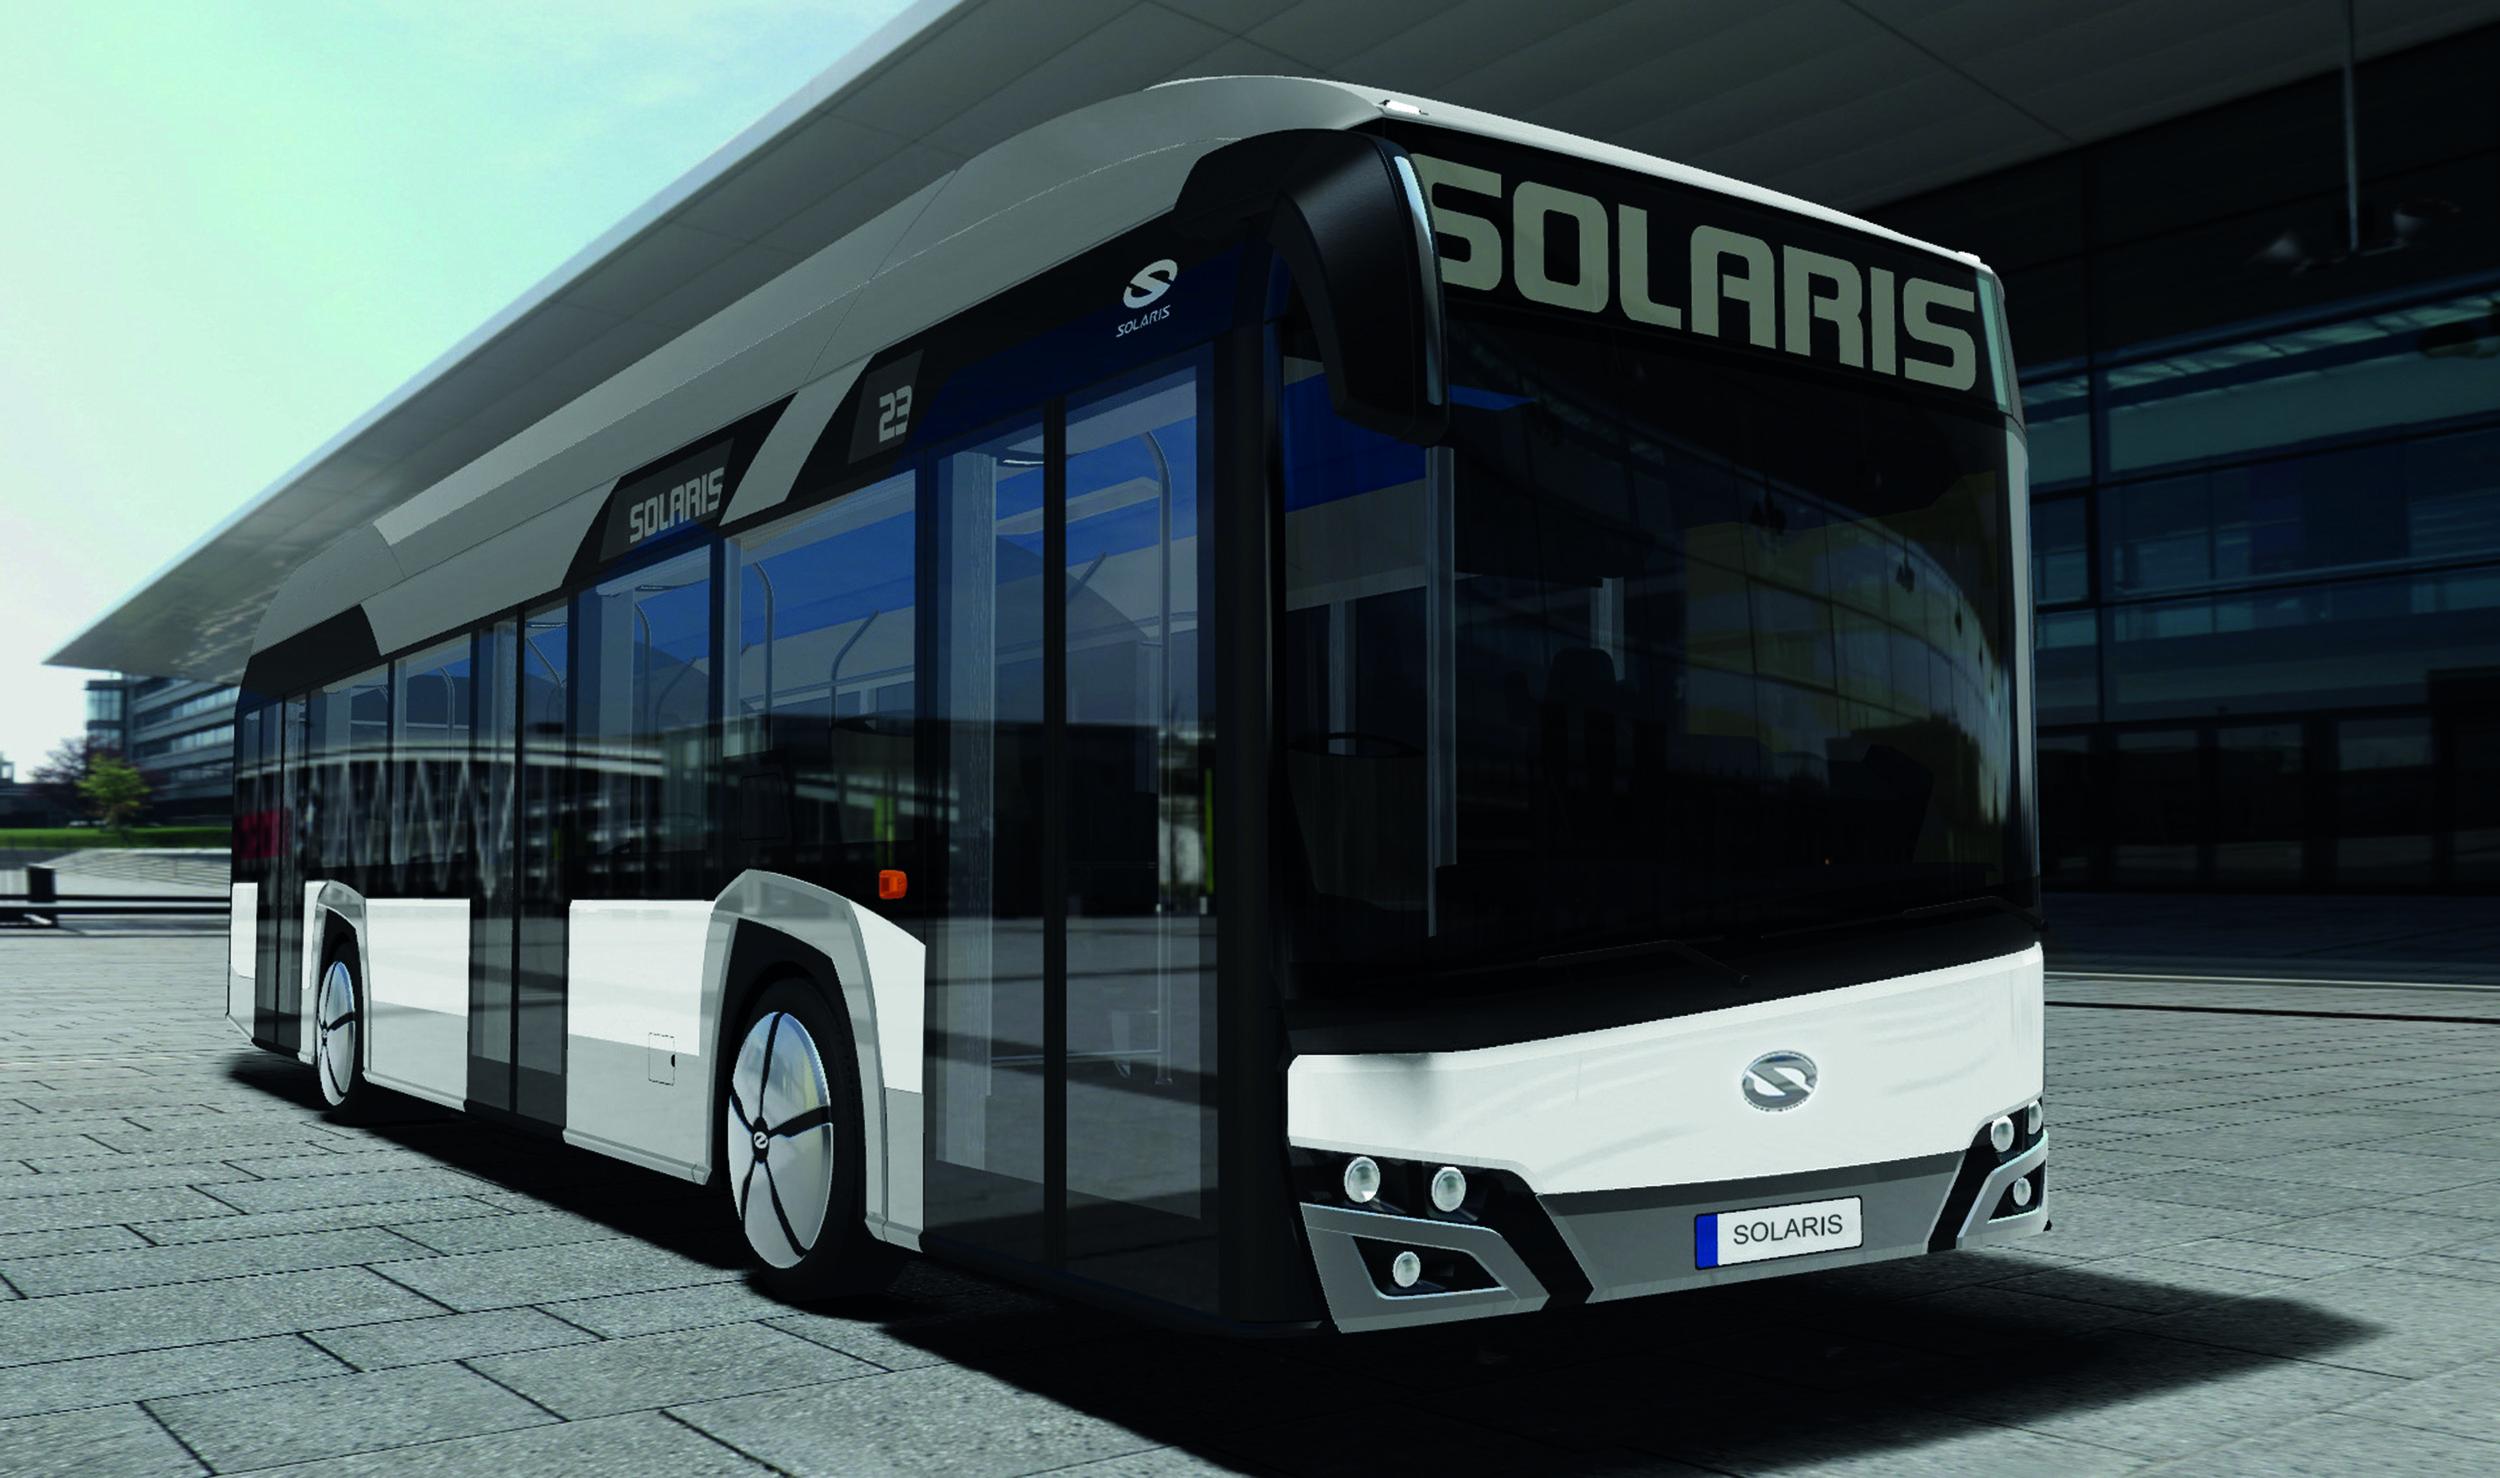 Solaris Urbino 12 Hydrogen na vizualizaci výrobce. (zdroj: Solaris Bus & Coach)